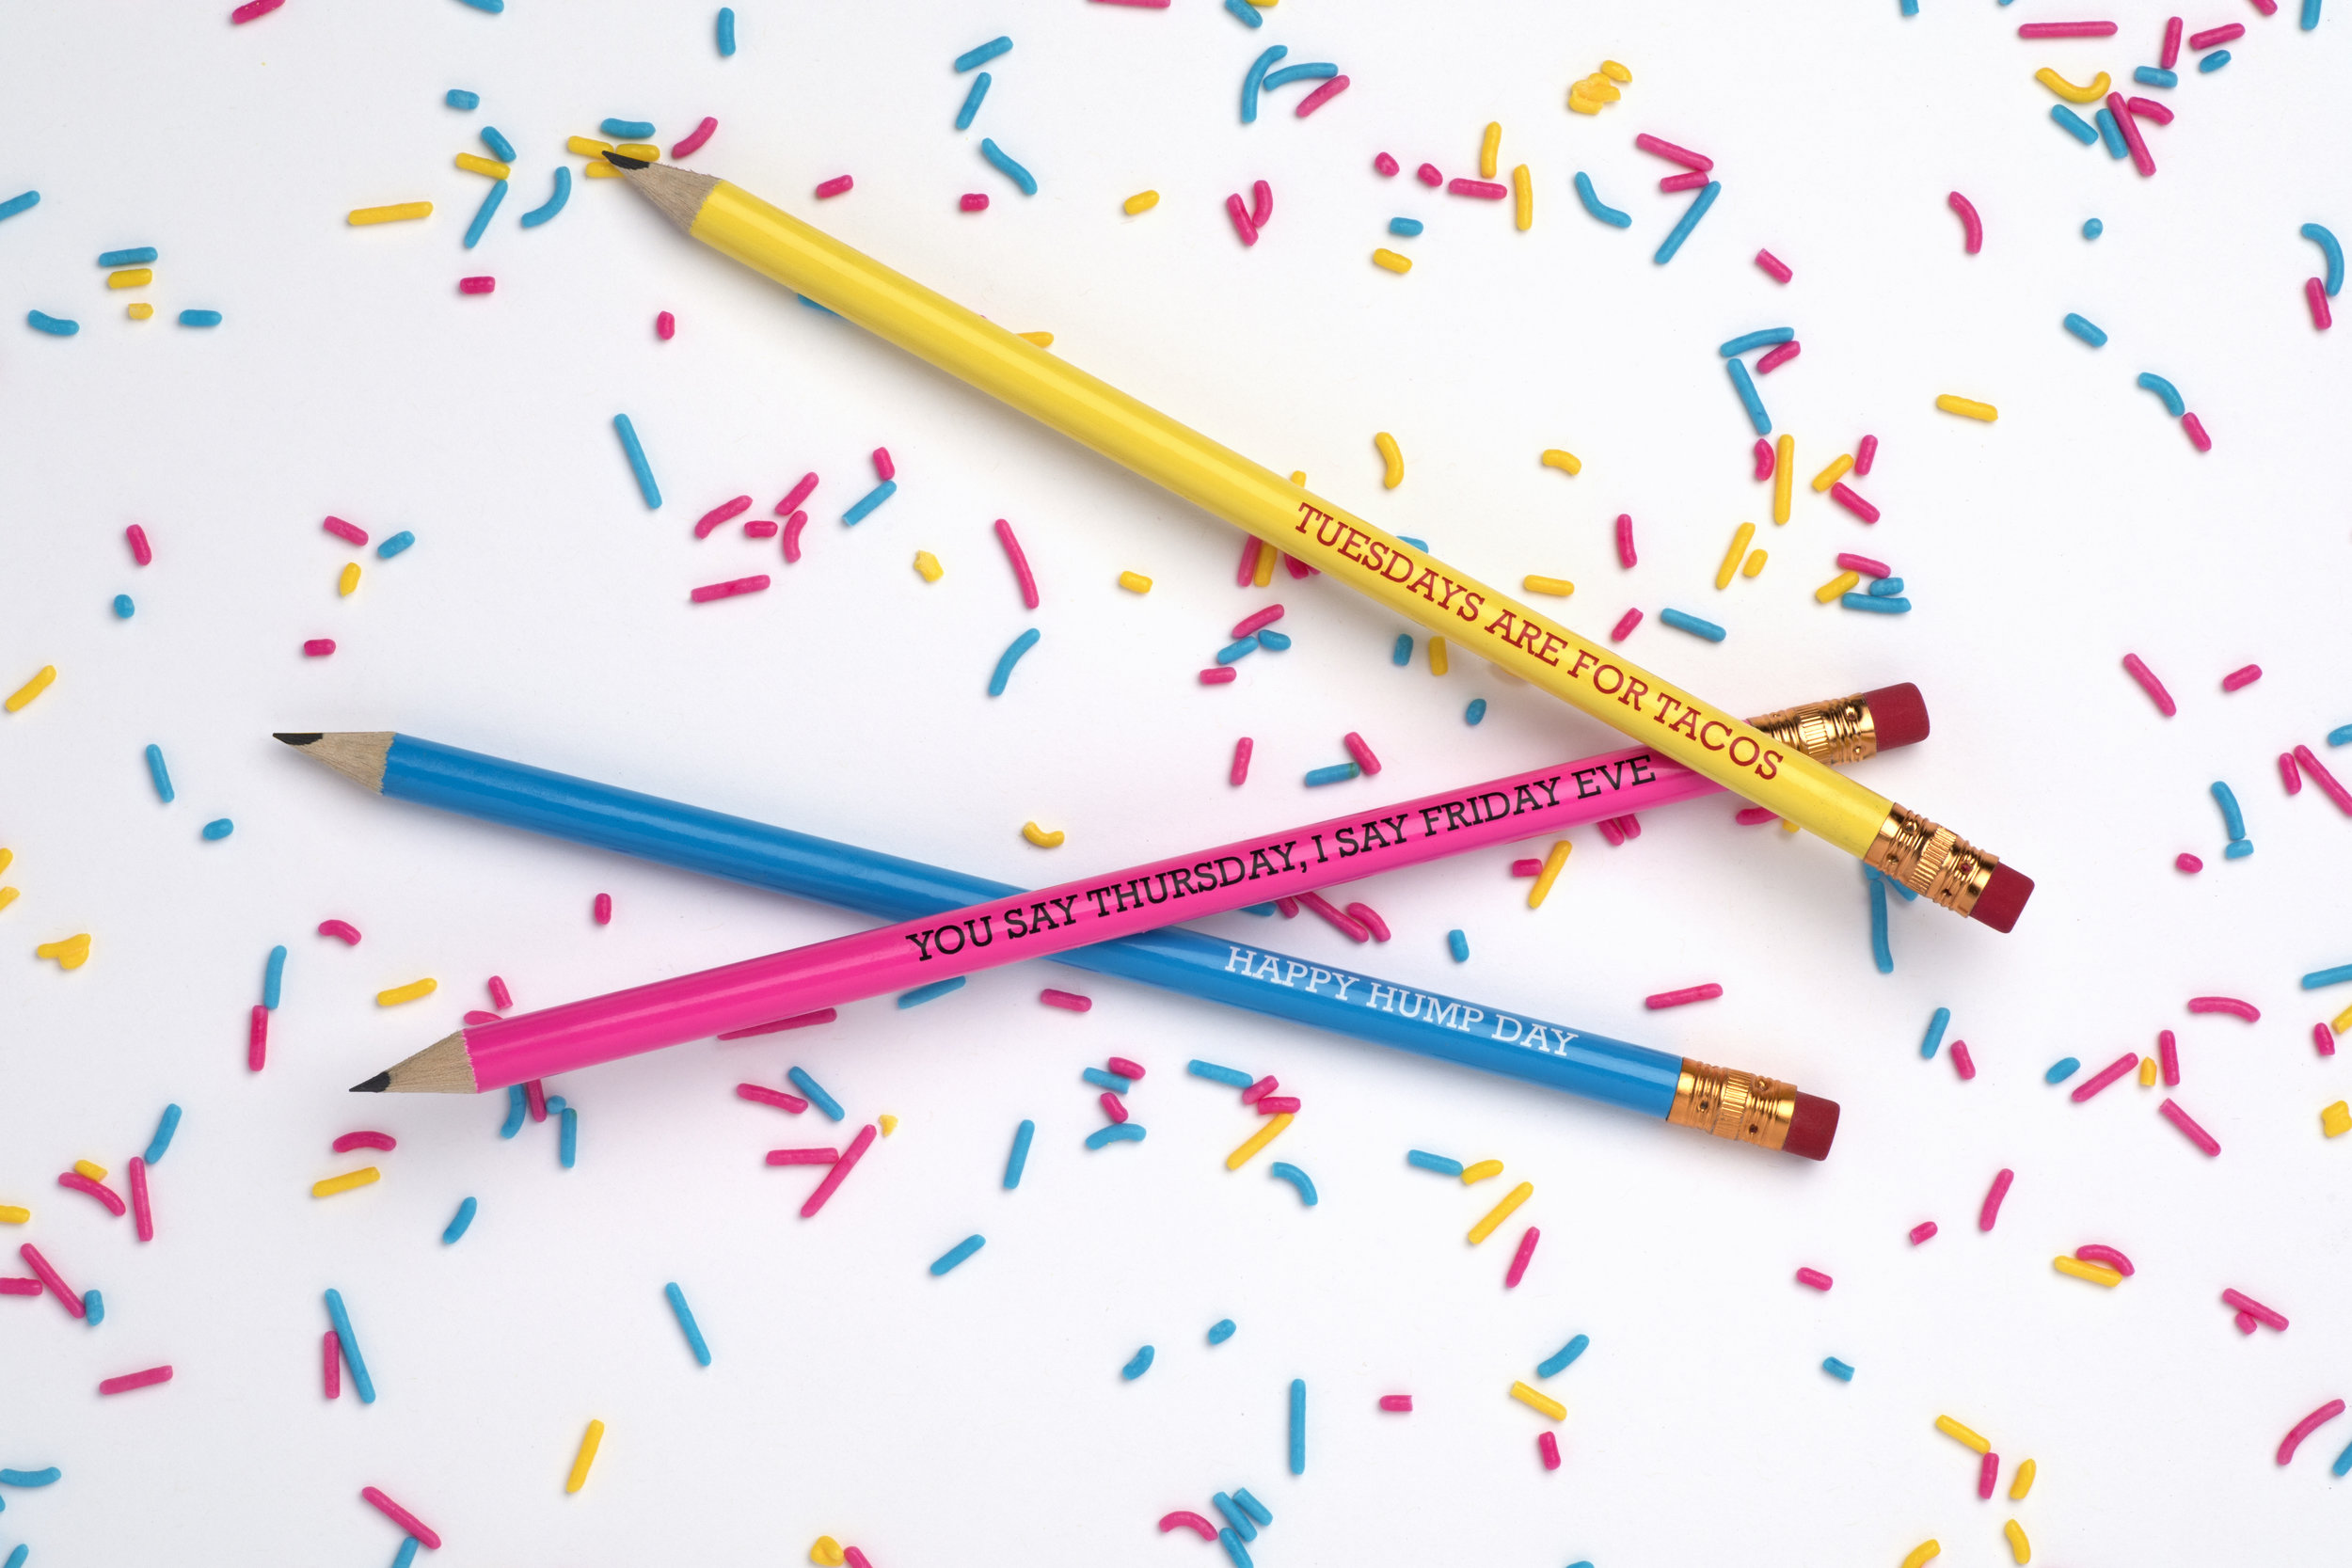 Snifty_LS_Pencils.jpg